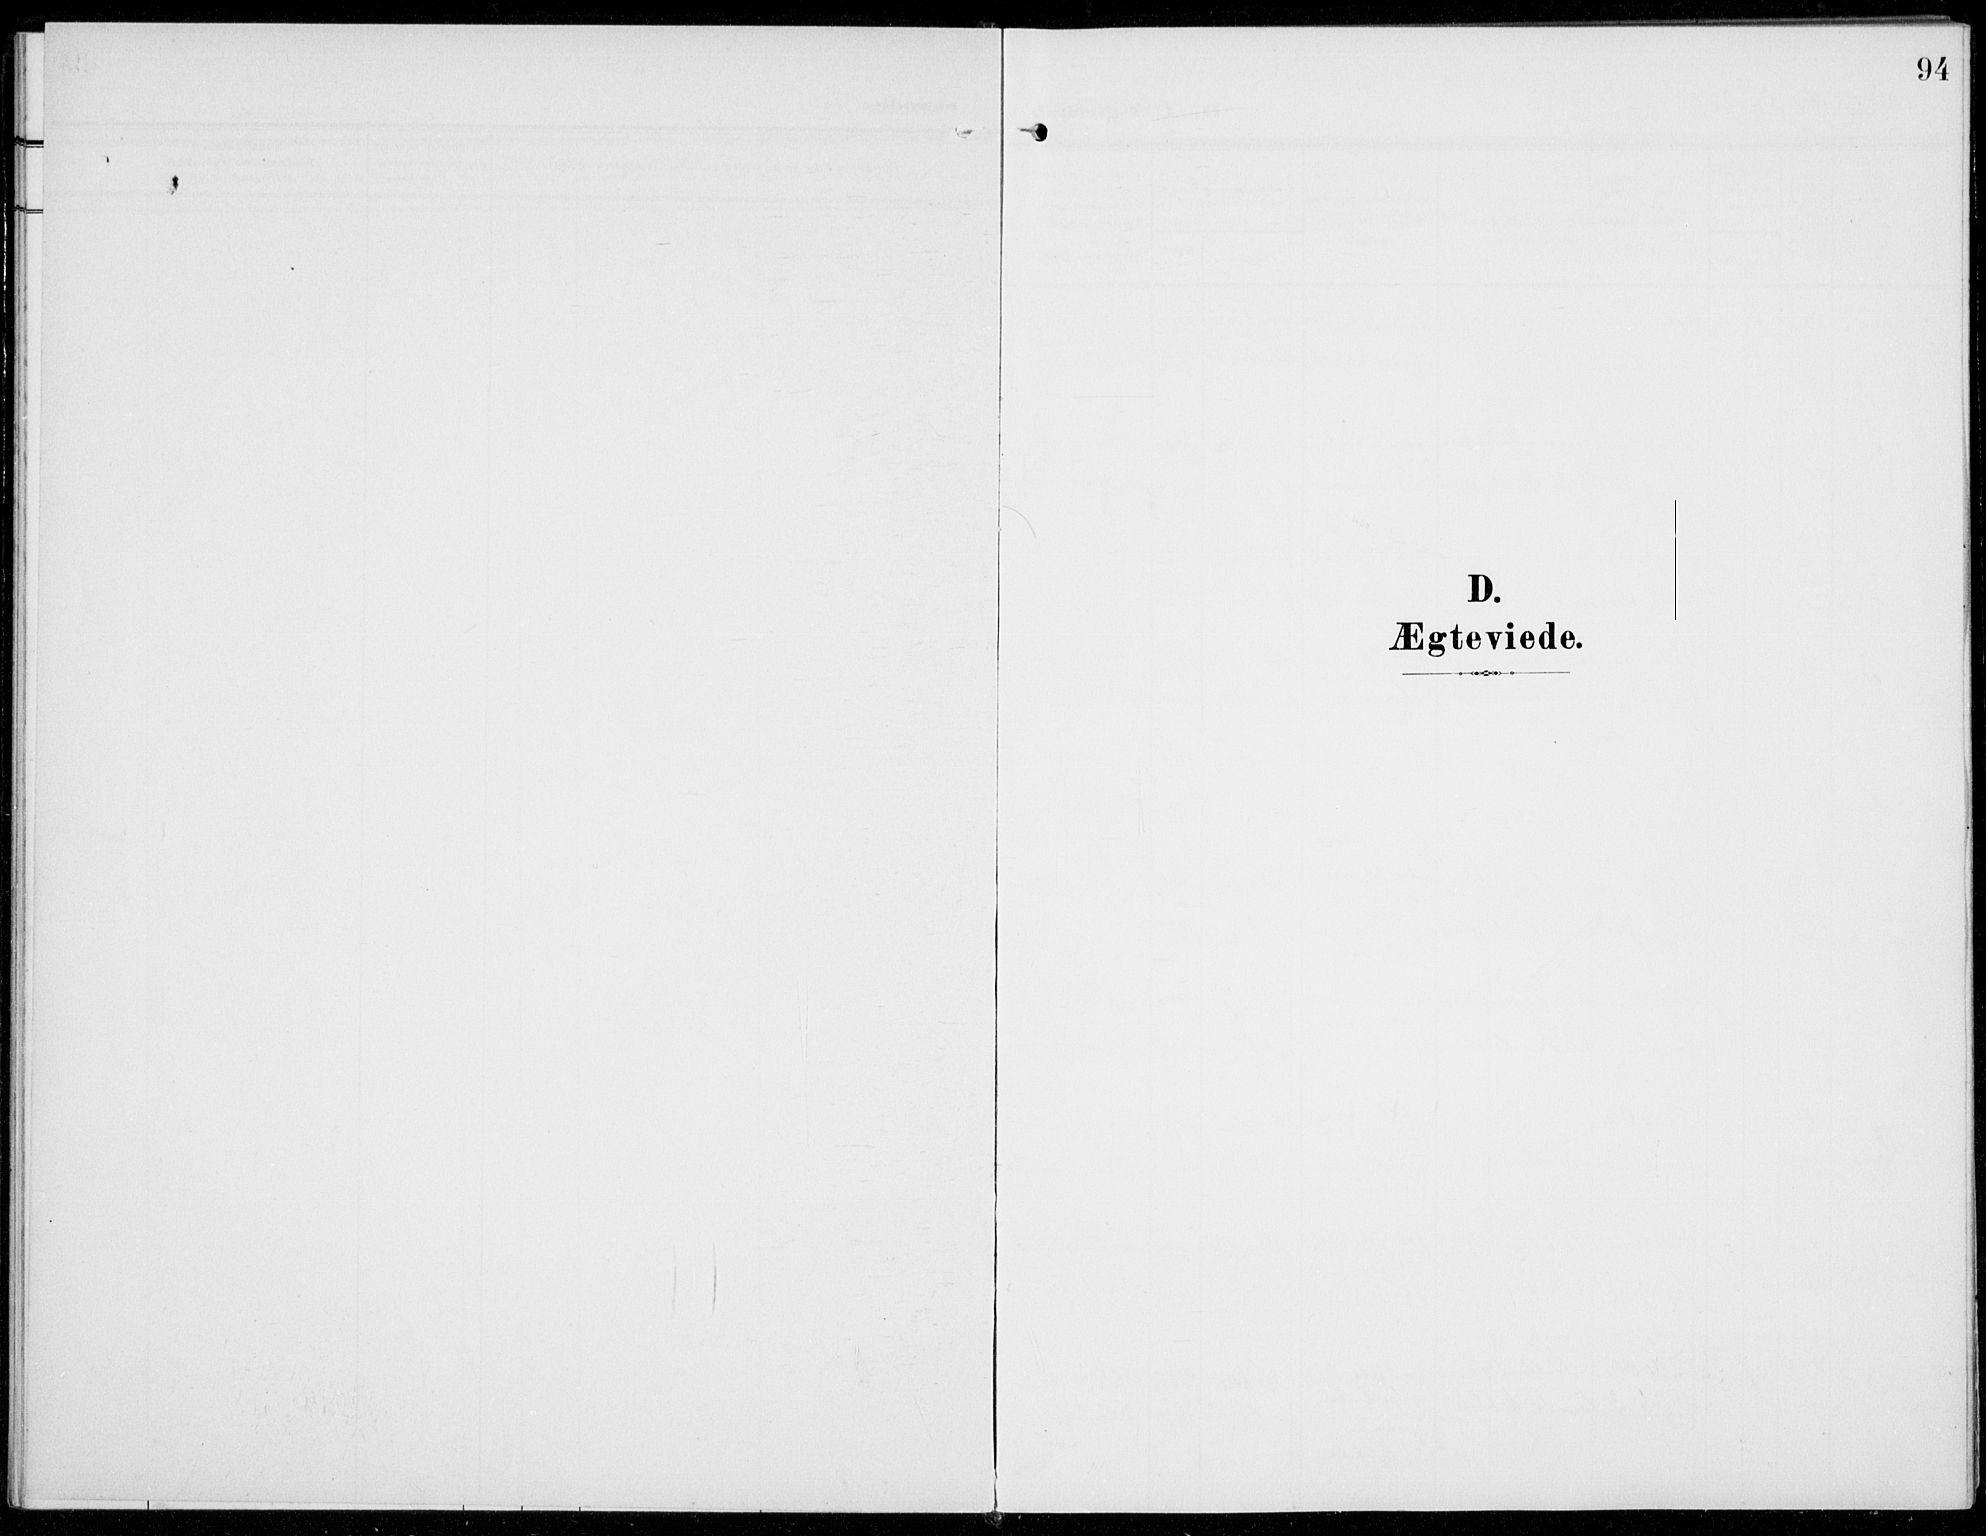 SAH, Sel prestekontor, Ministerialbok nr. 1, 1905-1922, s. 94